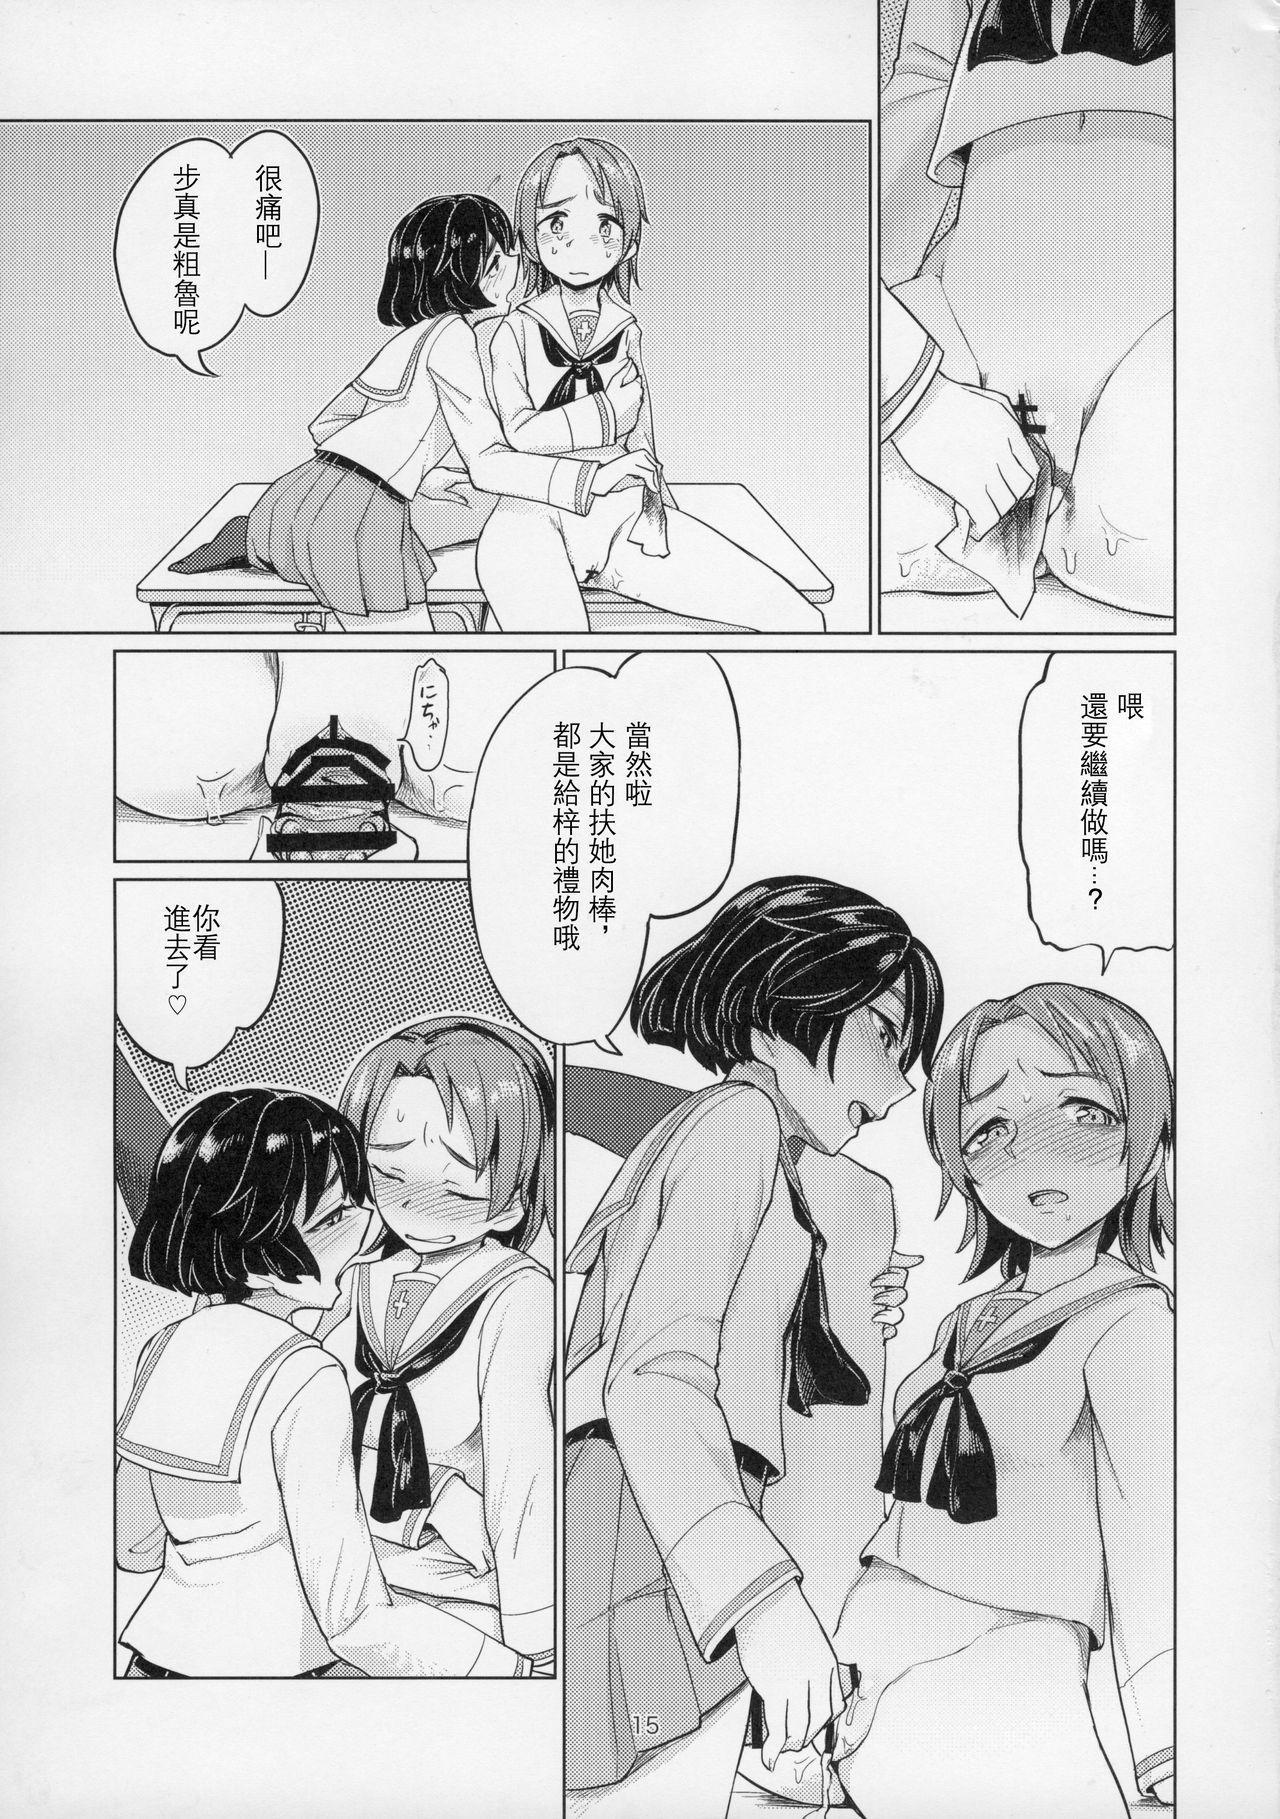 (C91) [Yakitate Jamaica (Aomushi)] Sawakan - Futanari Usagi-san no Sawa Azusa Kairaku Choukyou Hon (Girls und Panzer) [Chinese] [沒有漢化] 15